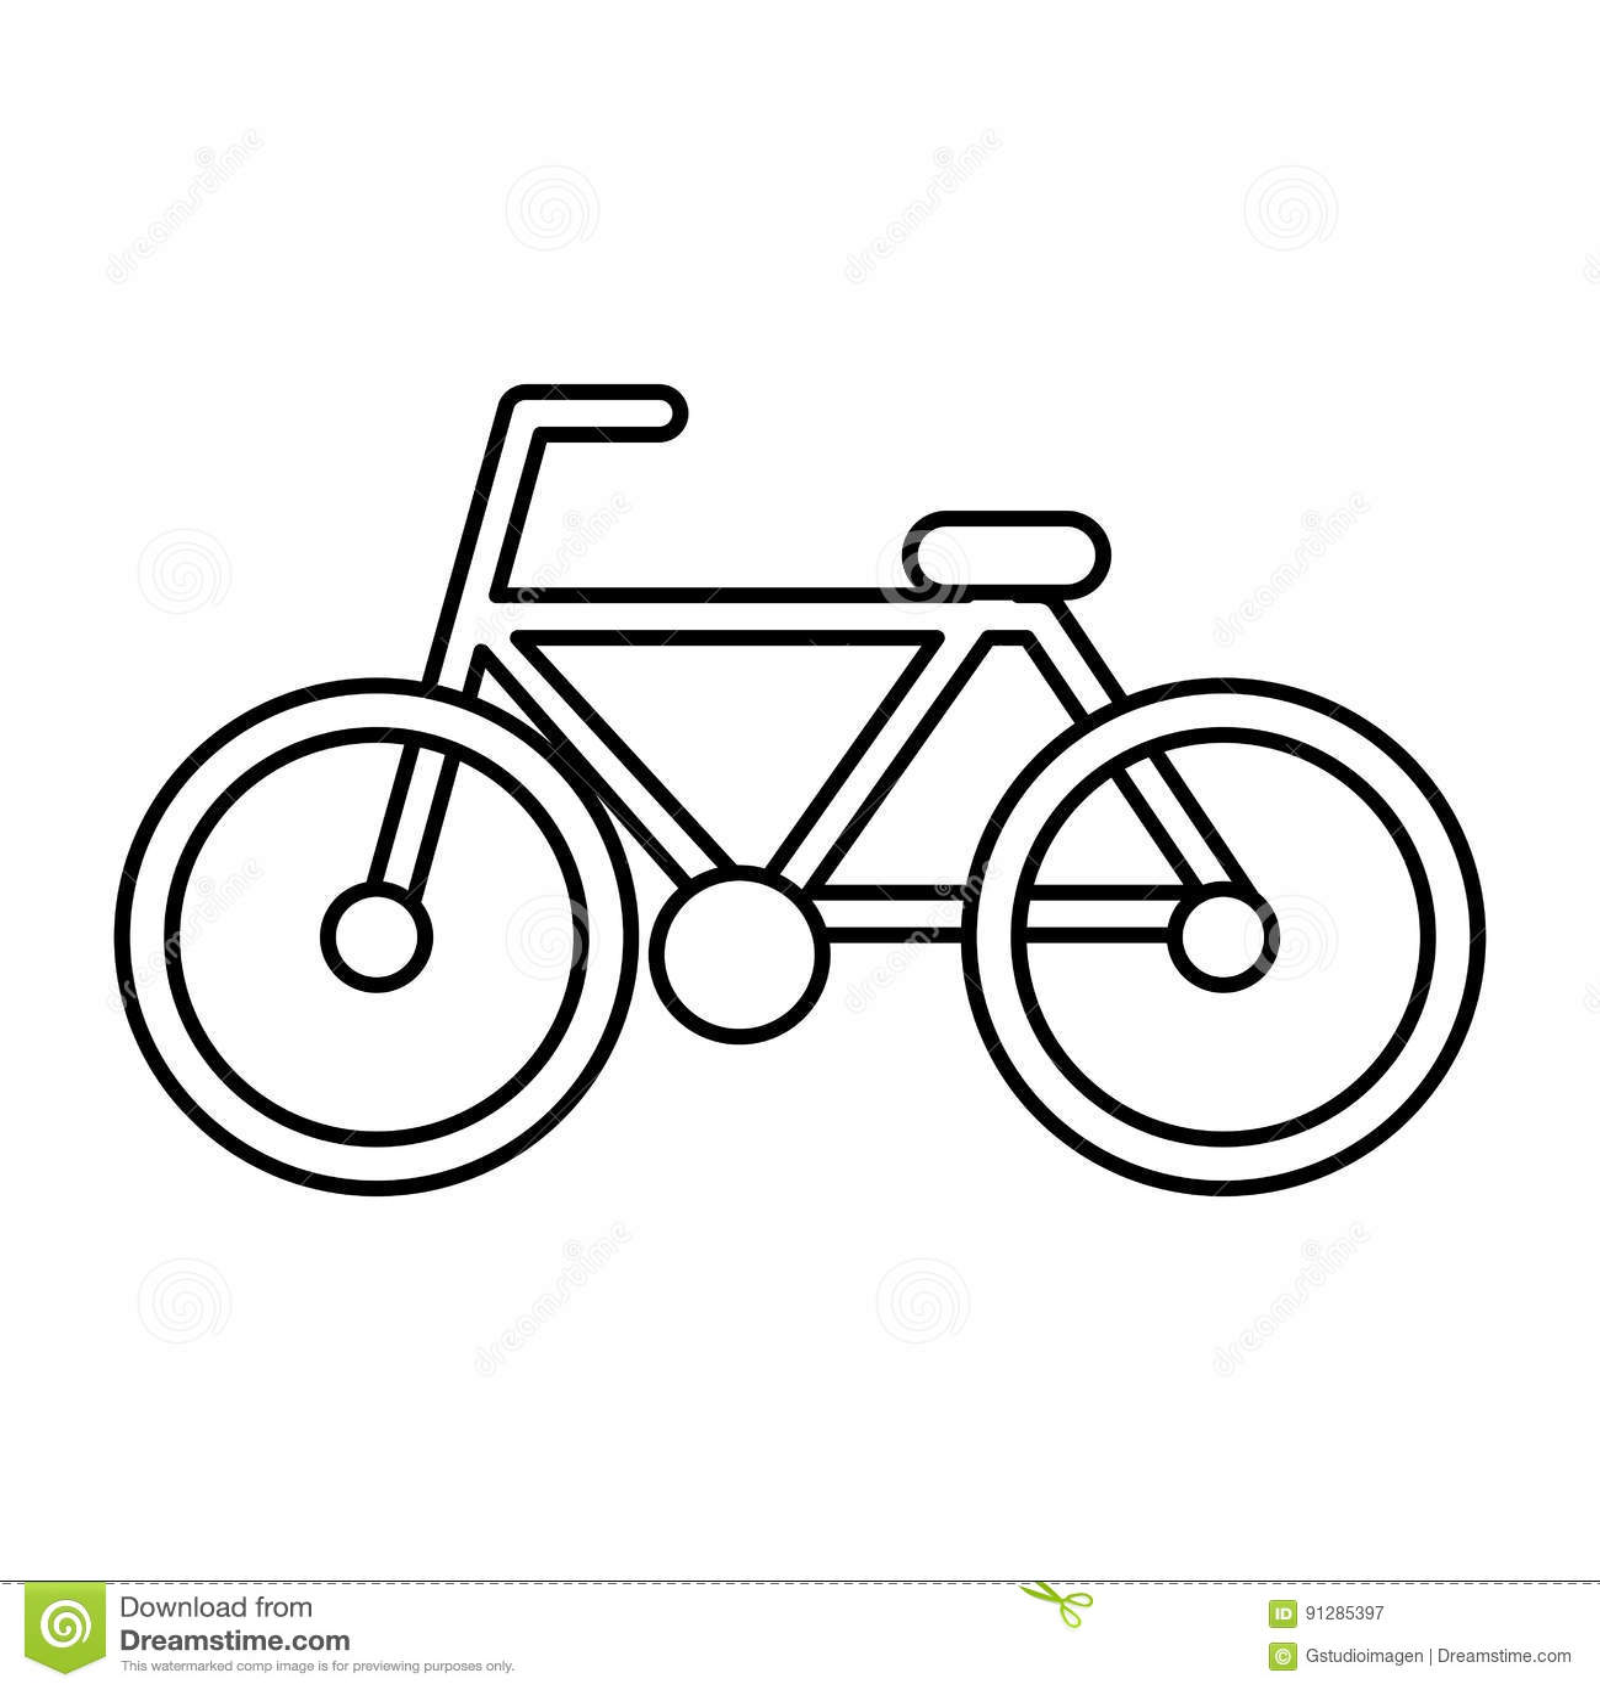 Isolerad symbol för cykel medel